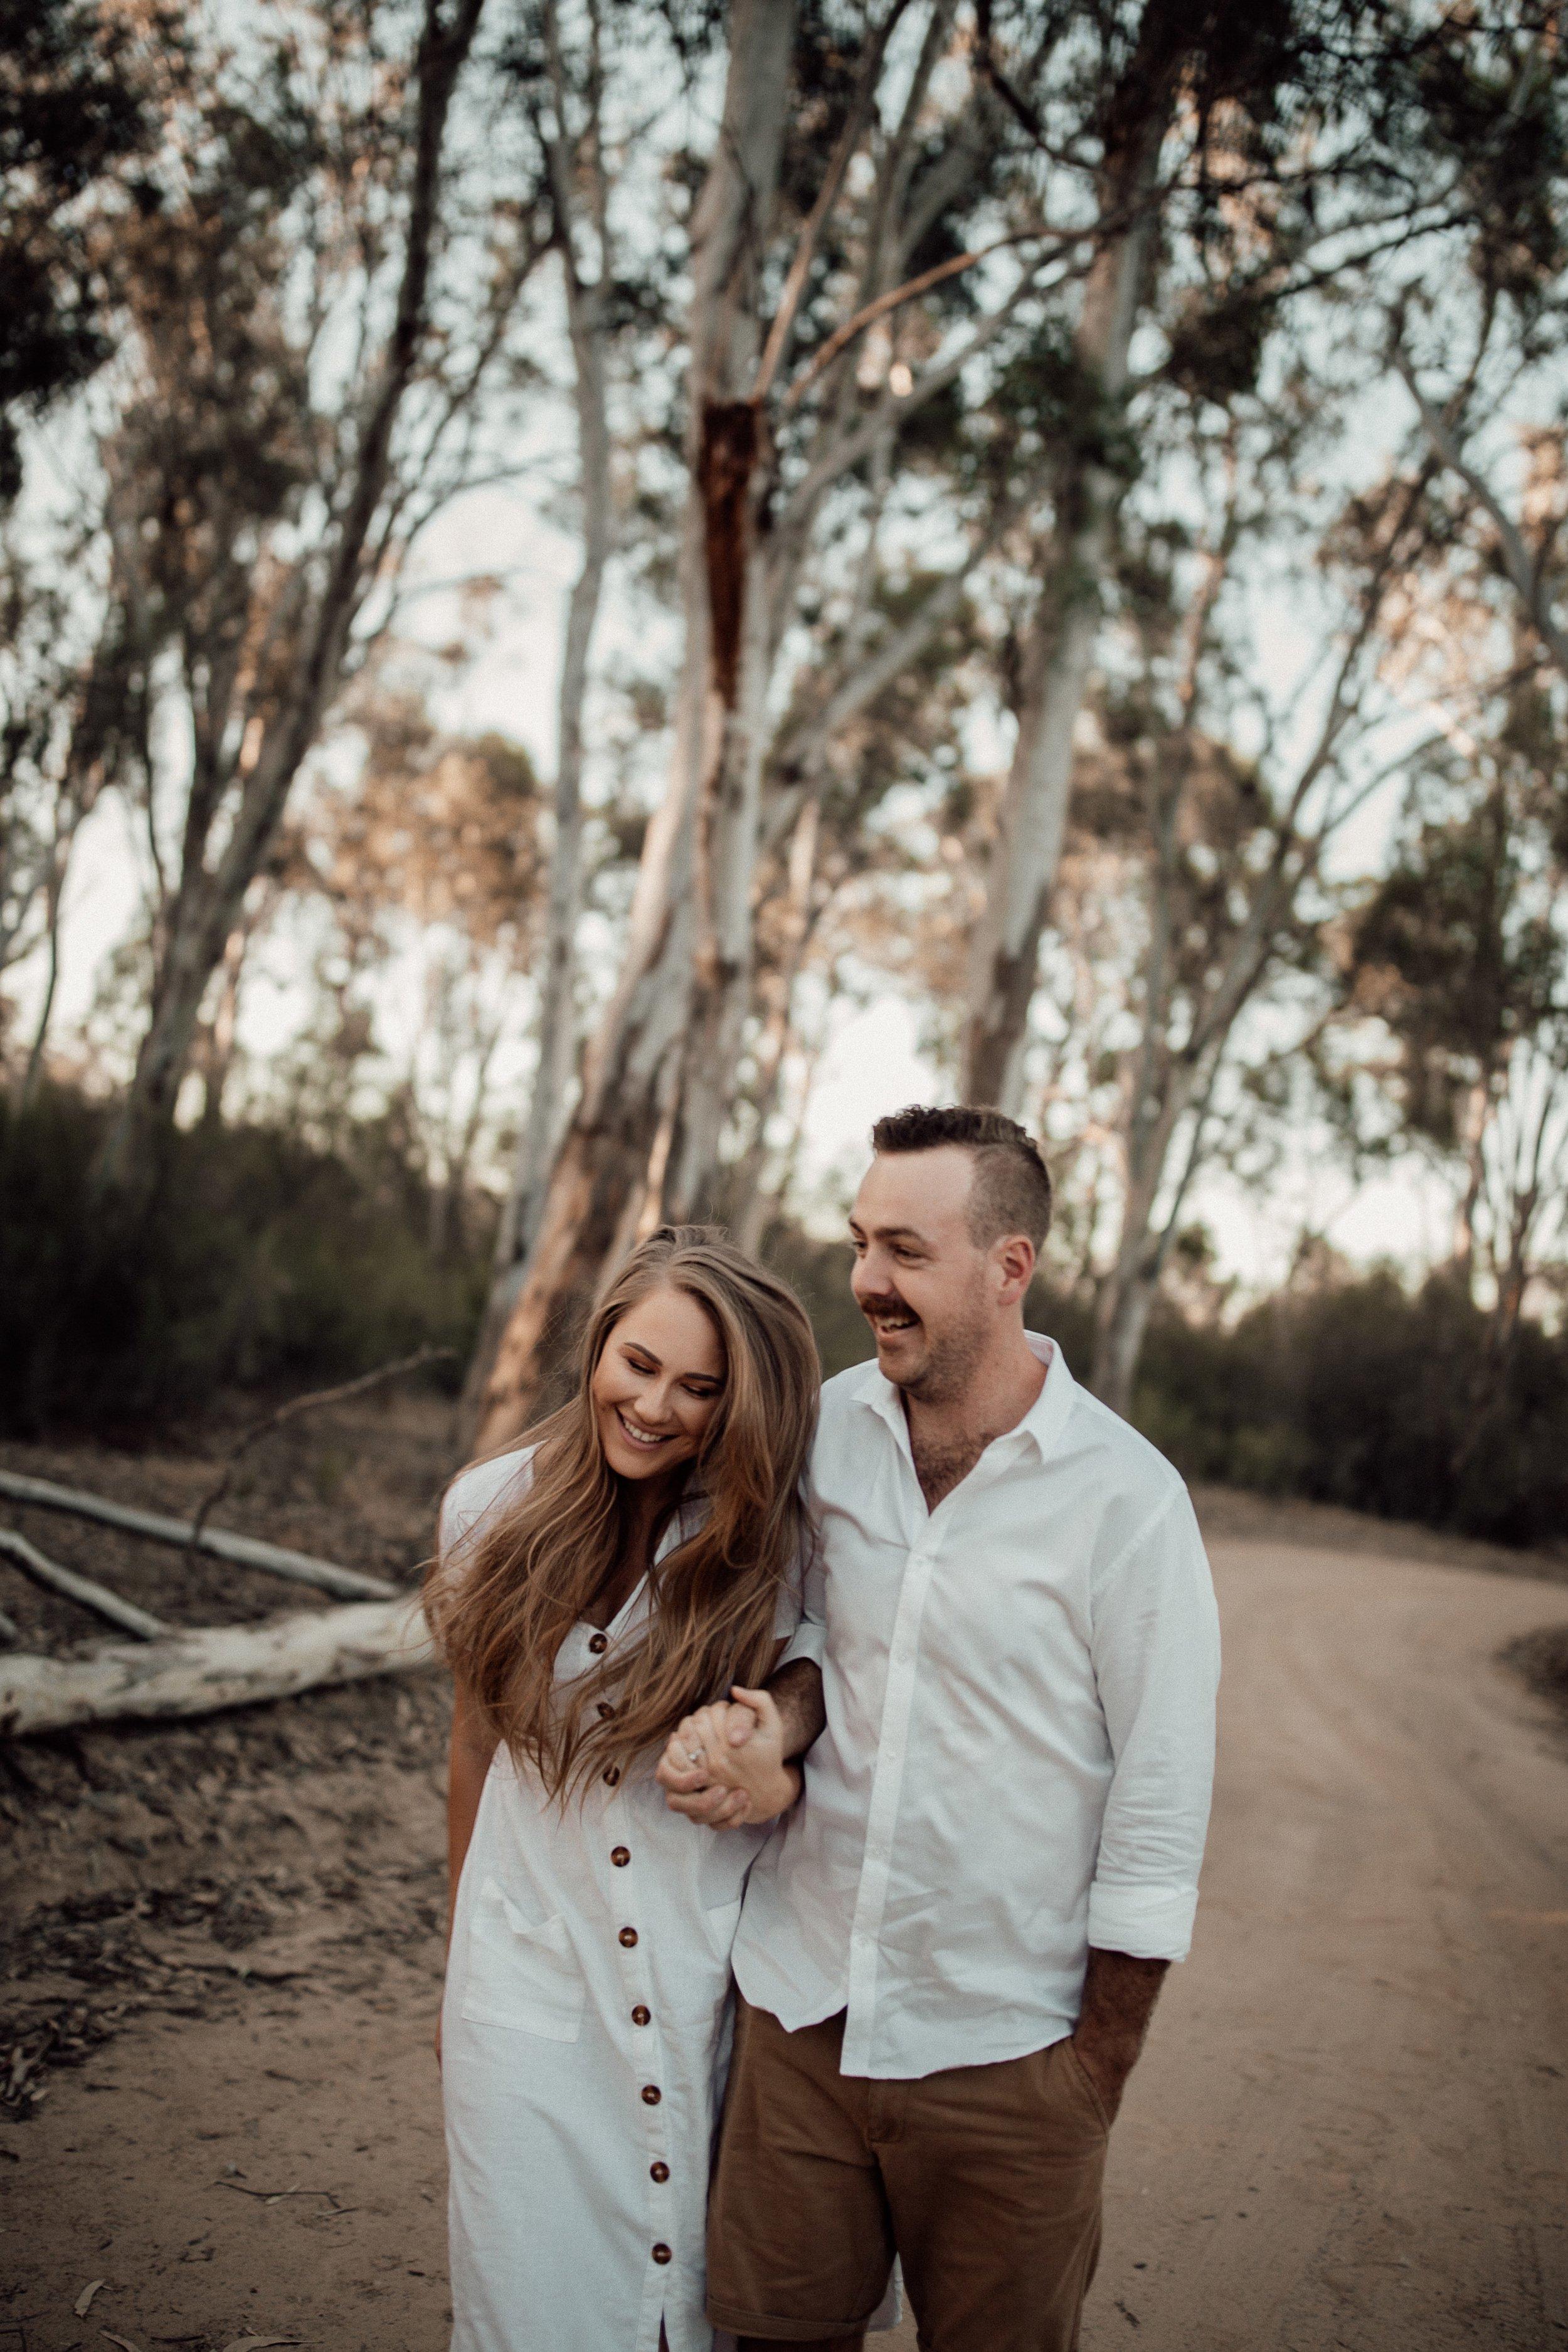 mickalathomas_puremacphotography_weddingphotographer_couplephotographer_Sheppartonphotographer_2817.jpg